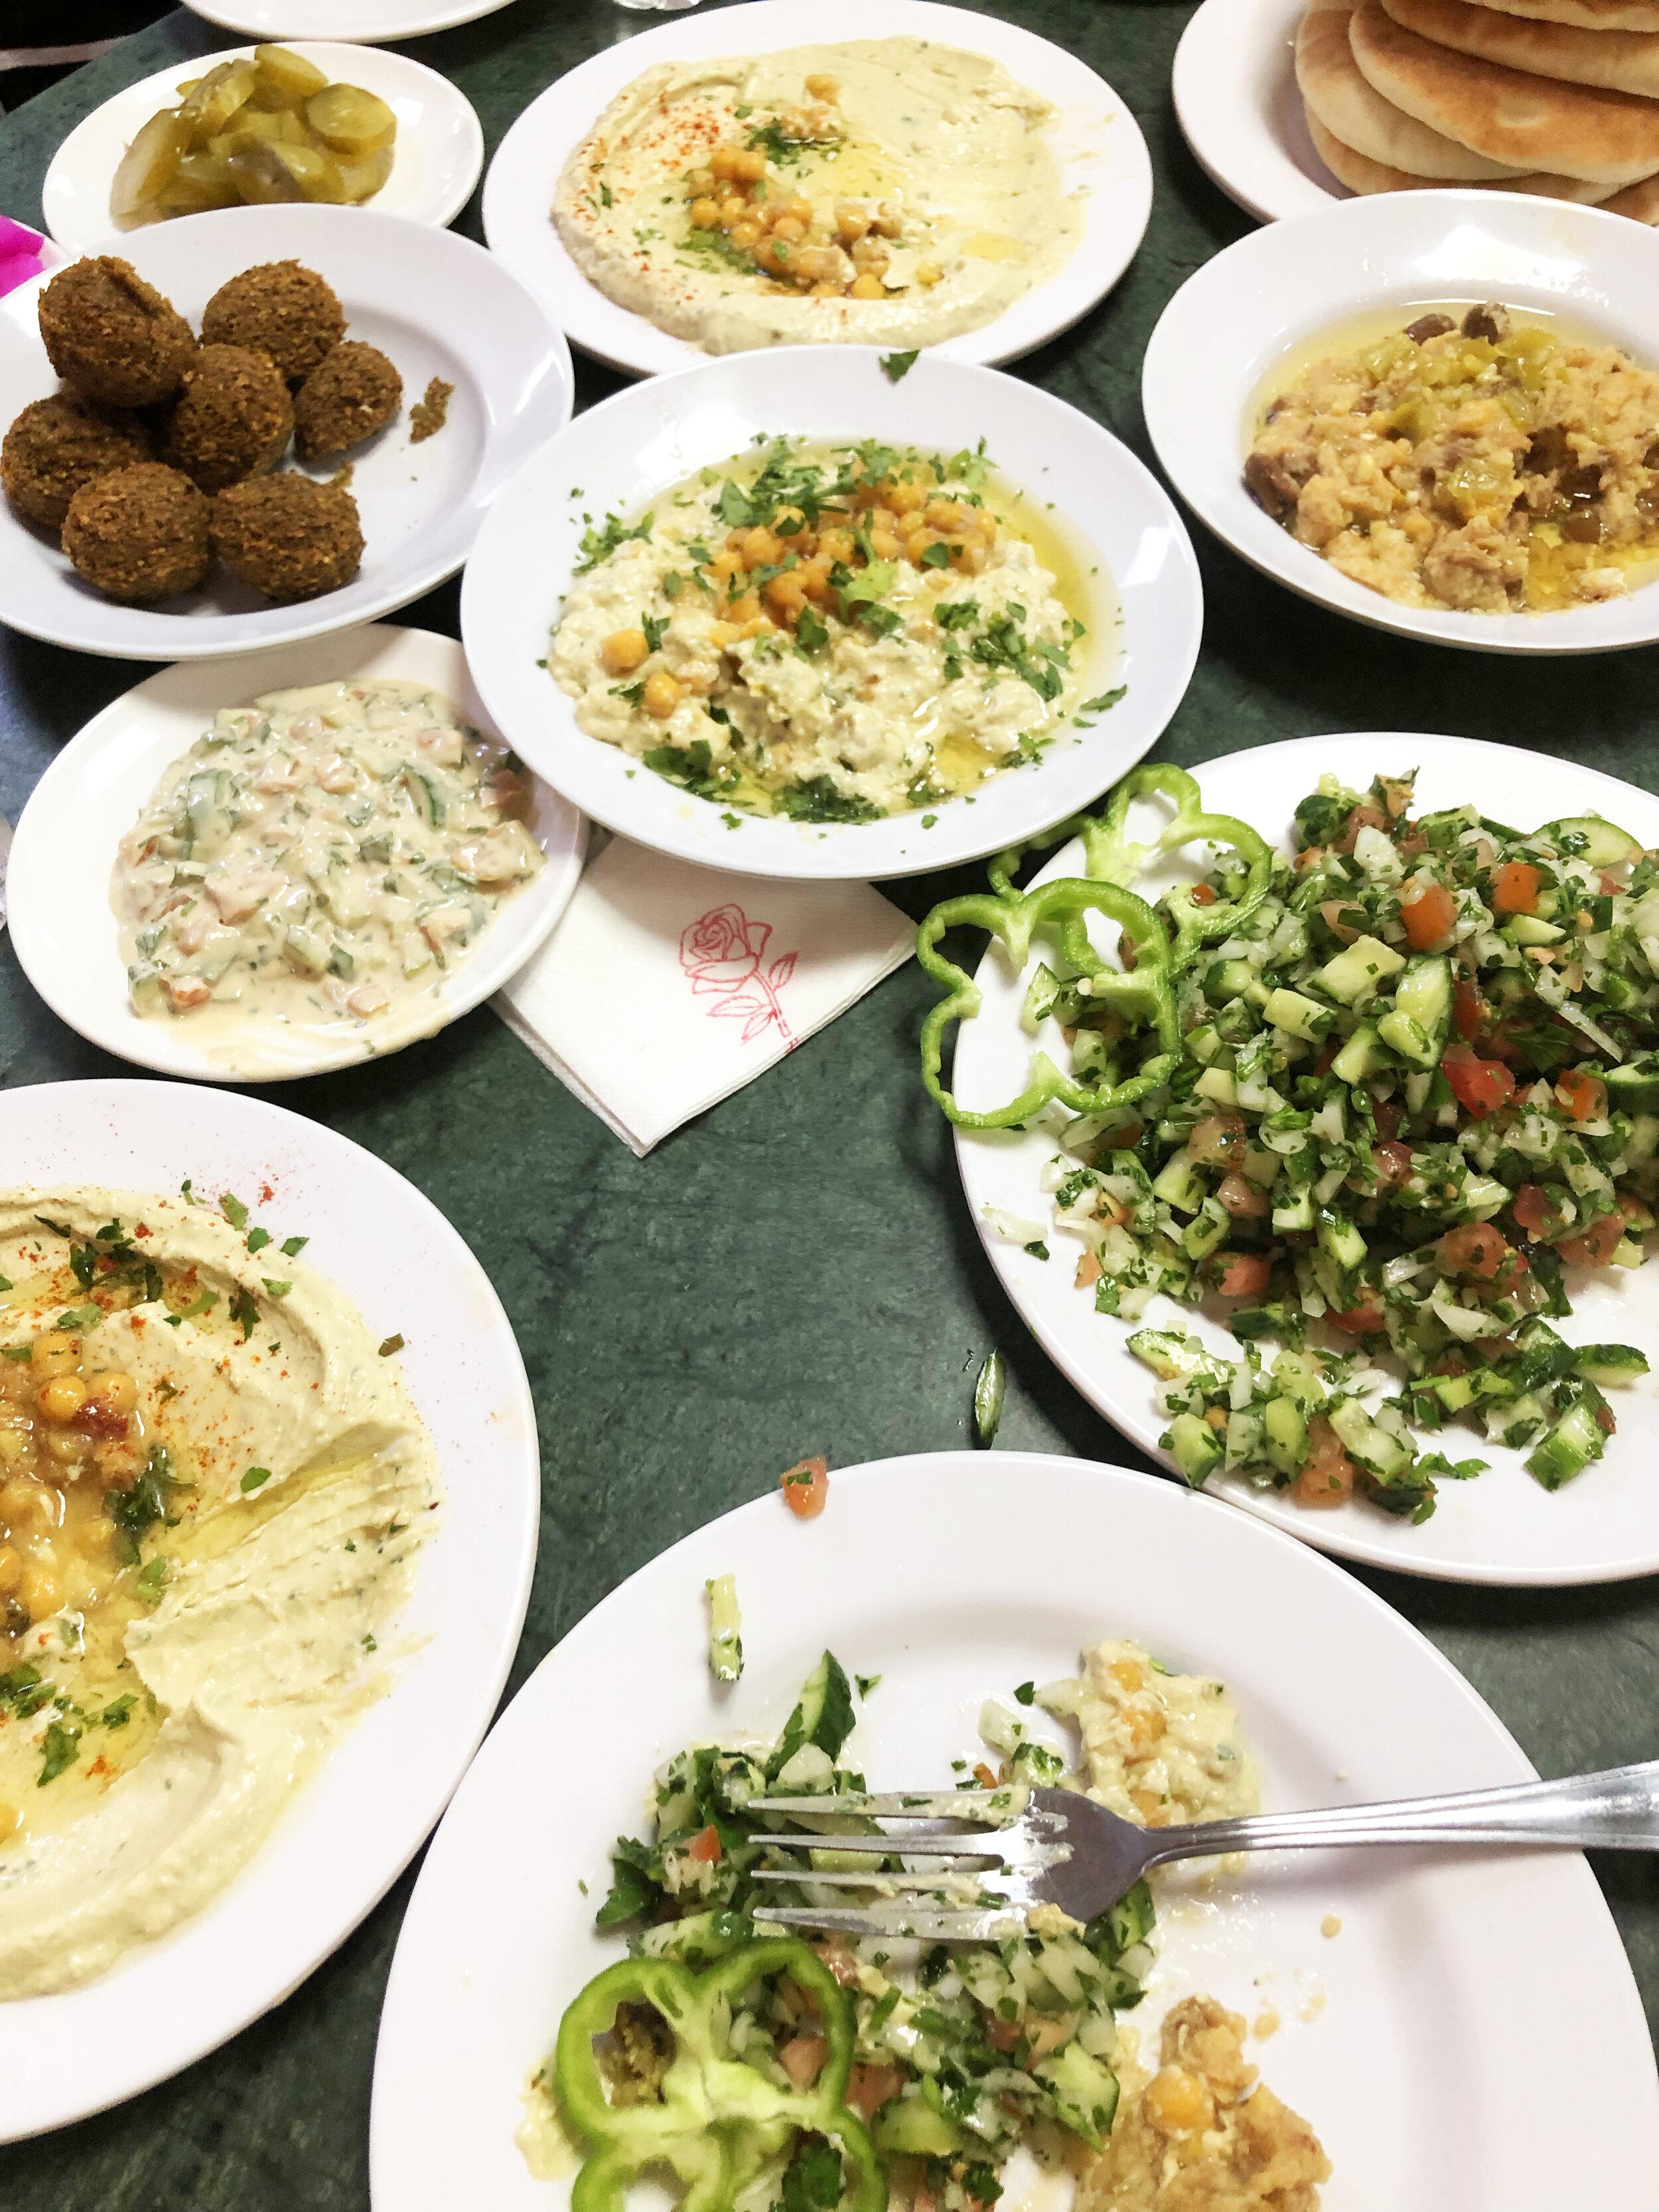 Traditional breakfast: vegetables, hummus, and falafel.